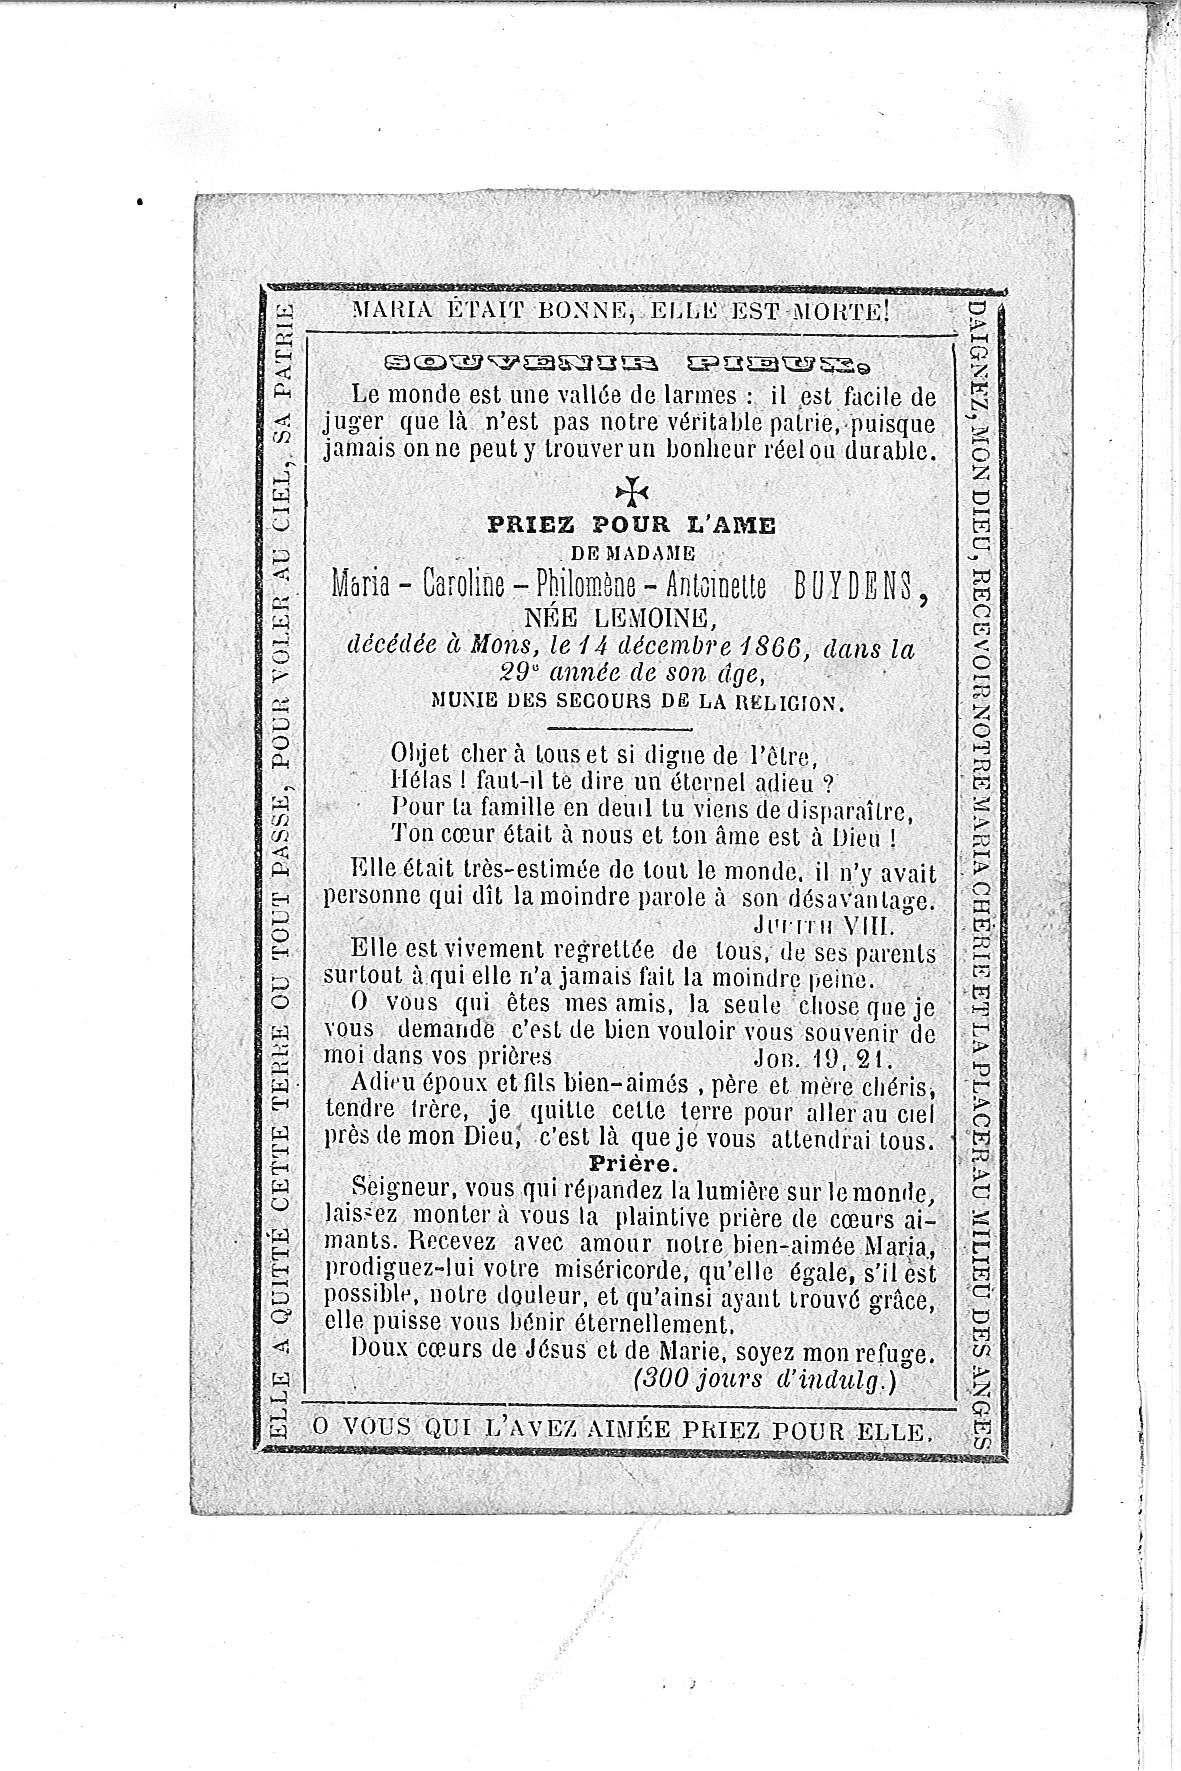 maria-caroline-philomène-antoinette(1867)20101014085217_00007.jpg